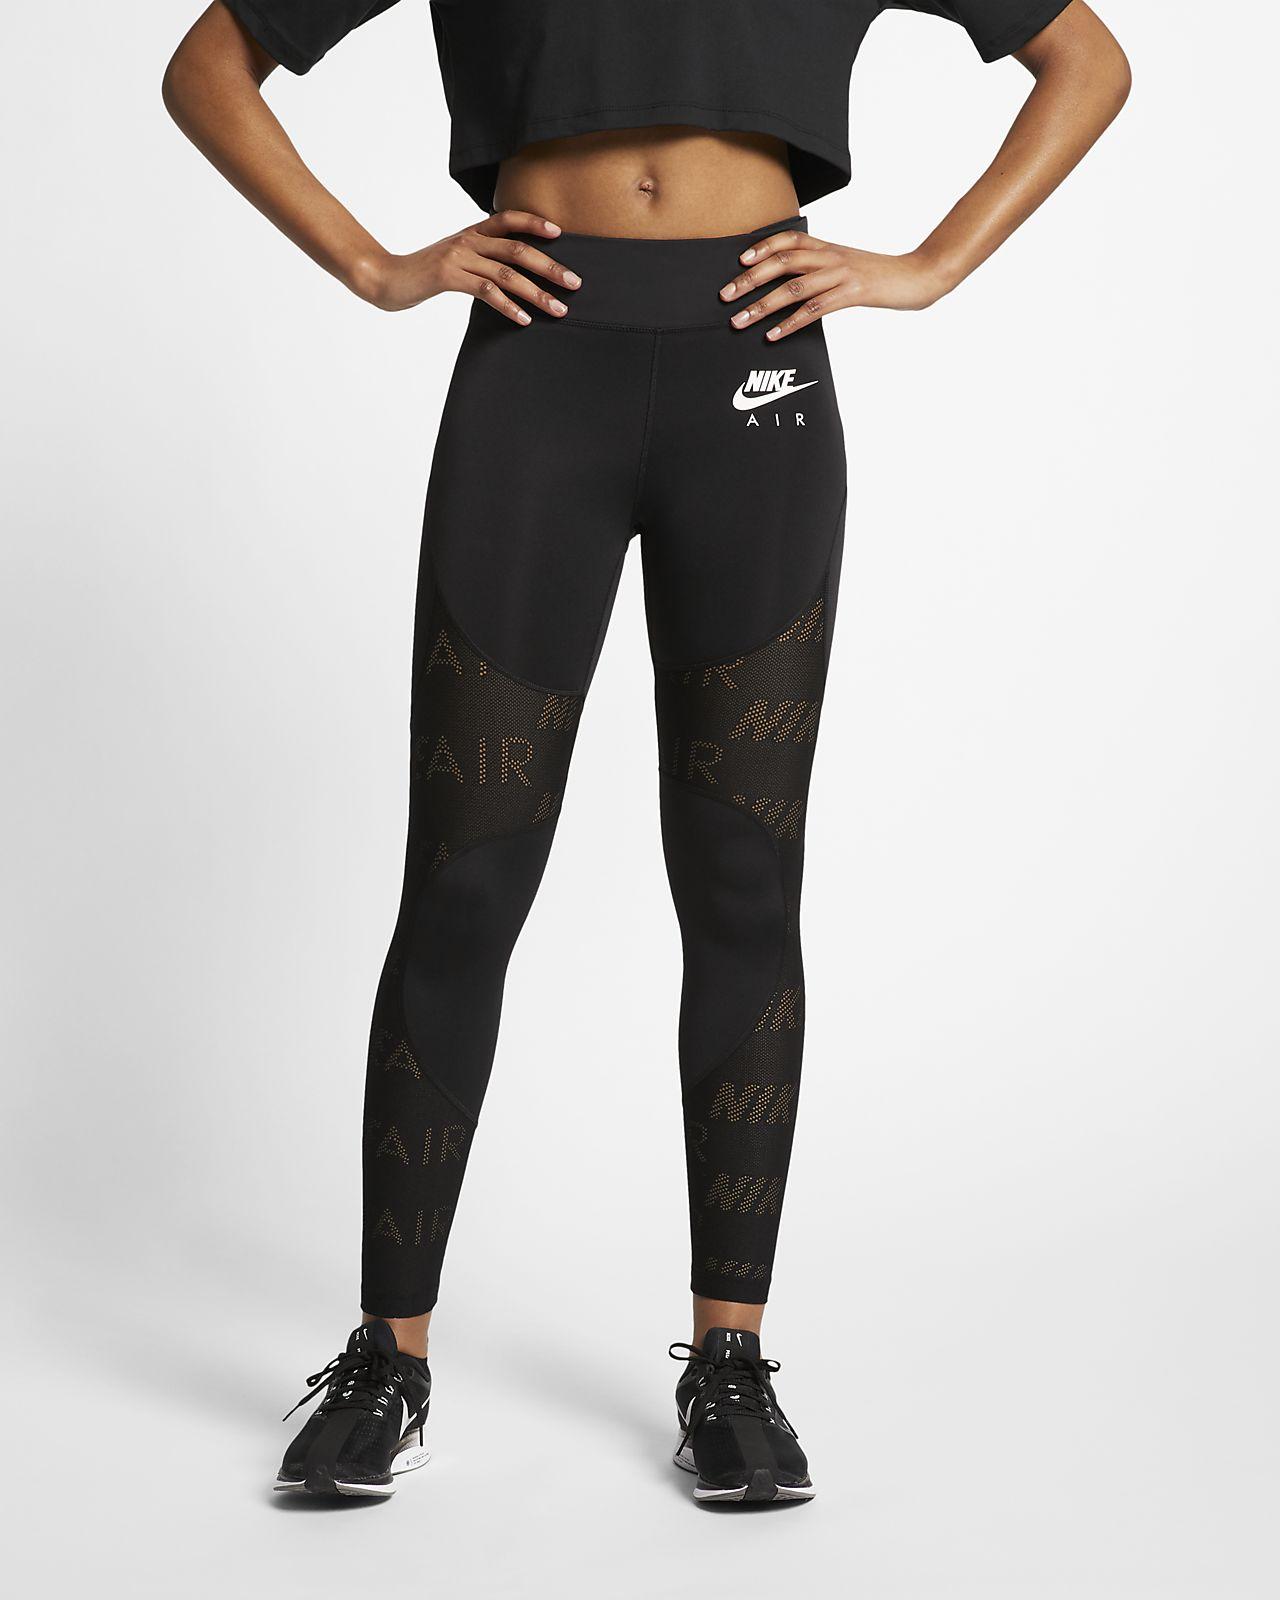 db2ede29eb9 Nike Air Fast 7/8-hardlooptights voor dames. Nike.com BE